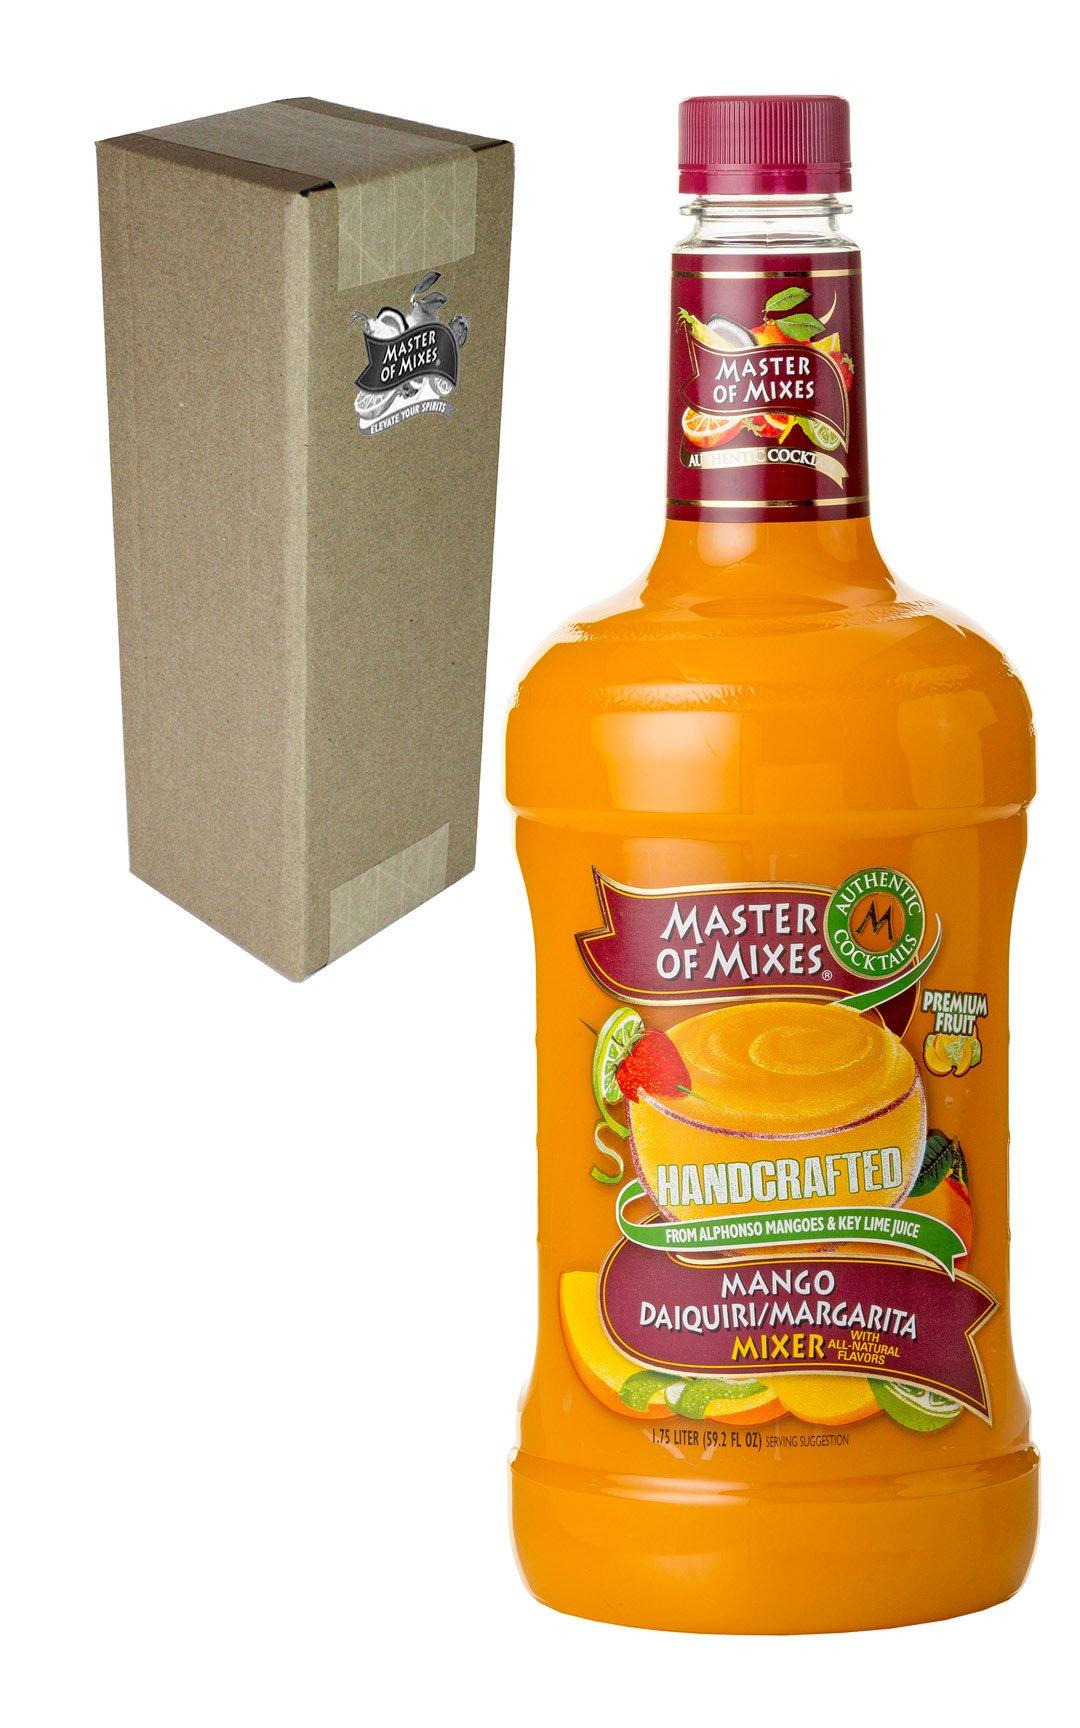 Master of Mixes Mango Daiquiri/Margarita Drink Mix, Ready to Use, 1.75 Liter Bottle (59.2 Fl Oz), Individually Boxed by Master of Mixes